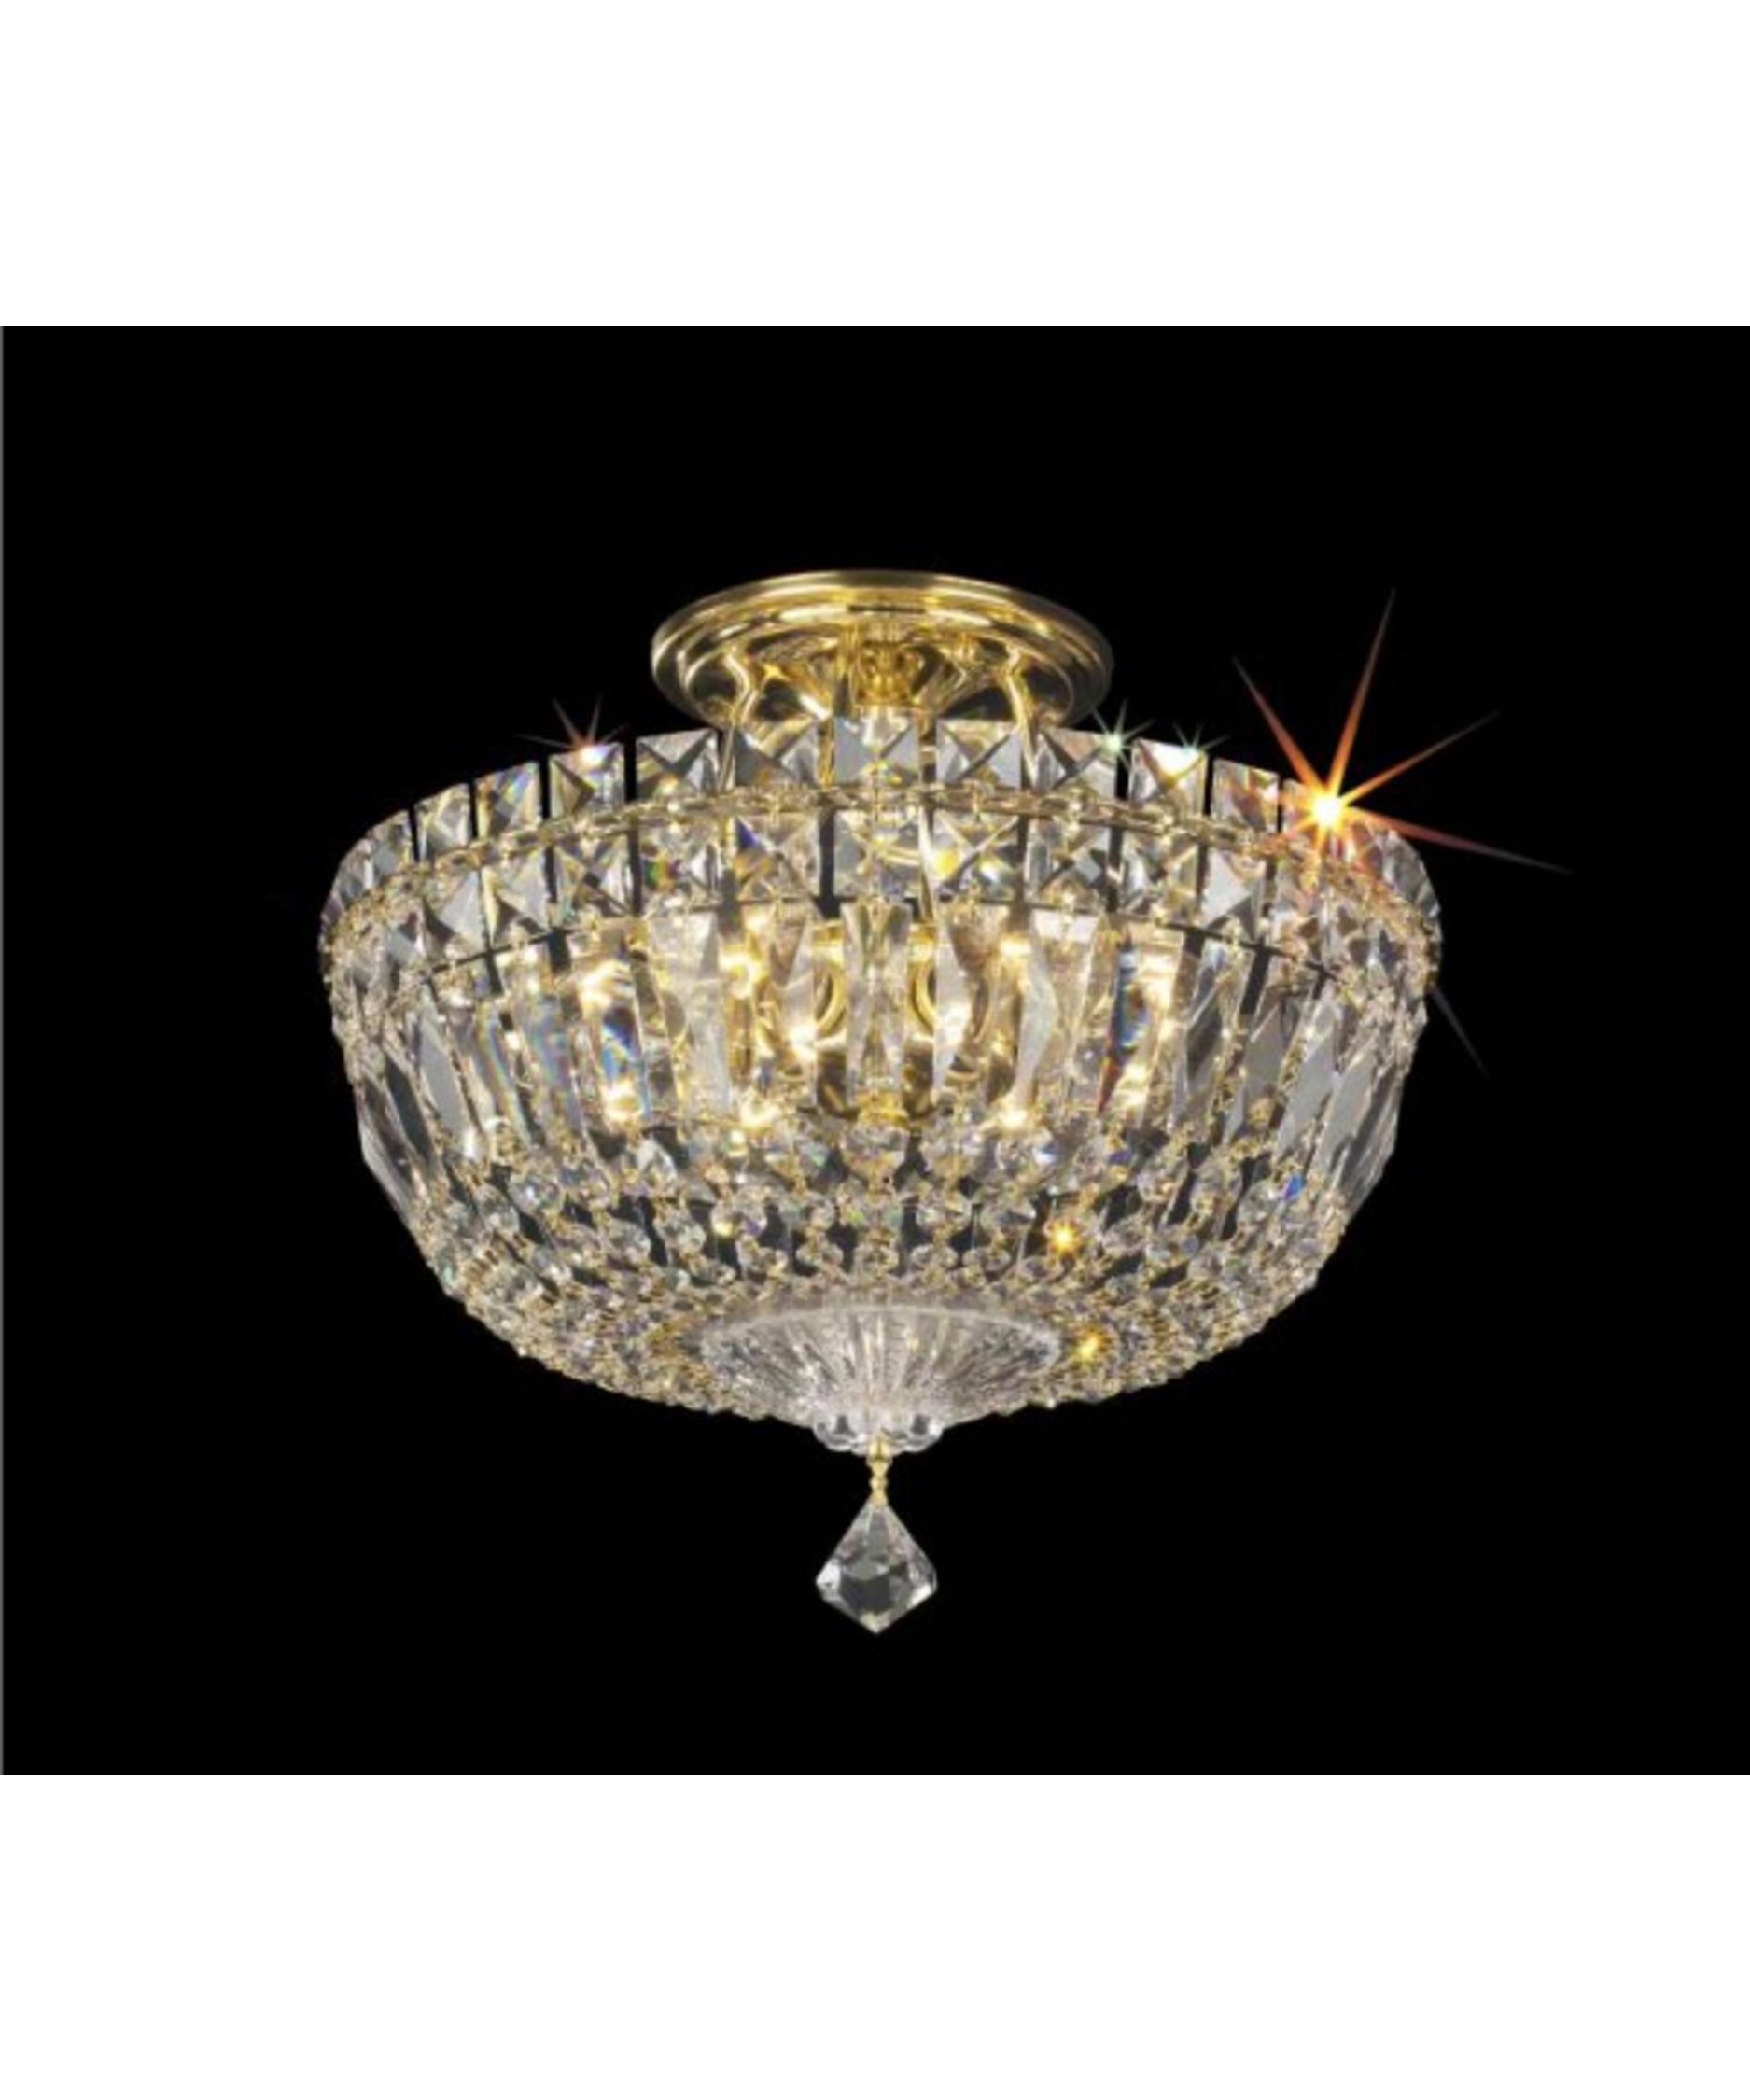 Favorite Light : Lovely Crystal Semi Flush Mount Lighting In Chandelier Of Inside Wall Mount Crystal Chandeliers (View 4 of 15)